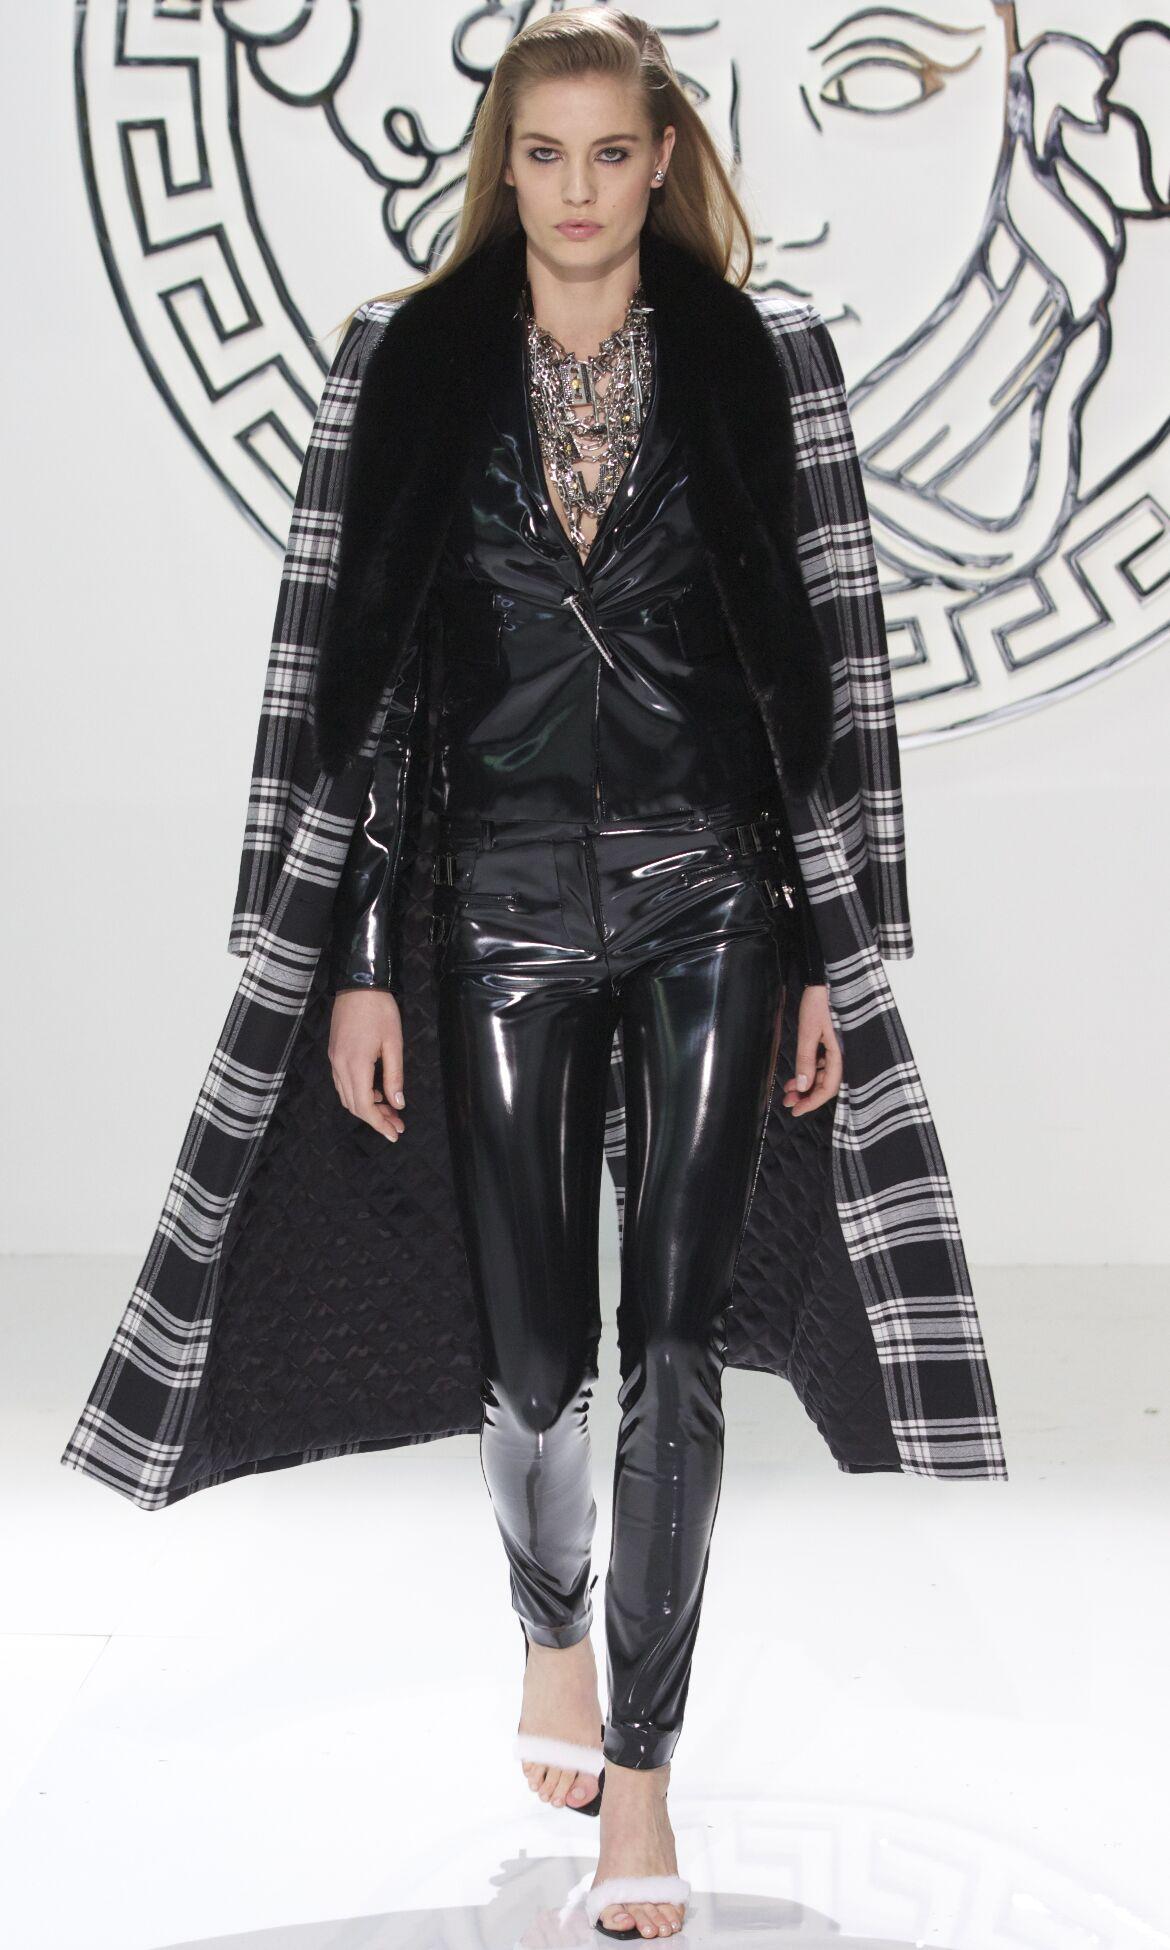 Catwalk Versace Fall Winter 2013 14 Women Collection Milan Fashion Week 4d9684964aad5